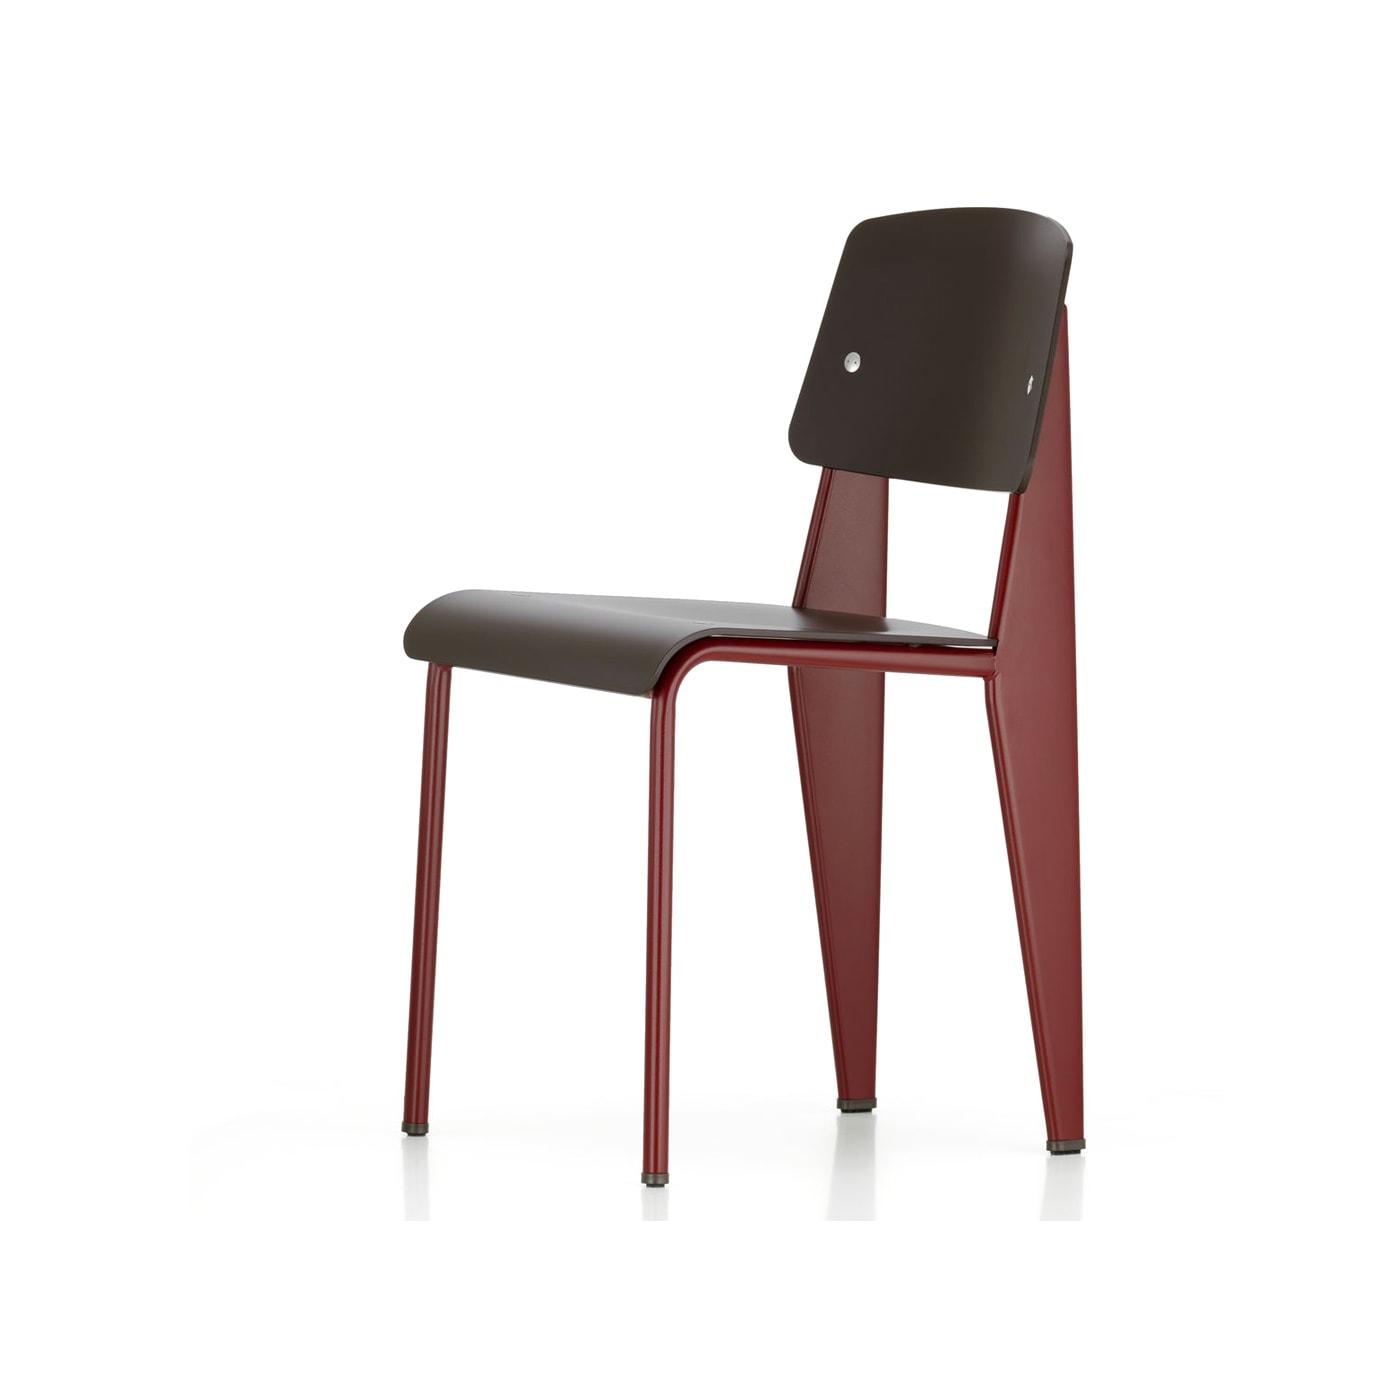 vitra standard SP sedia shop online